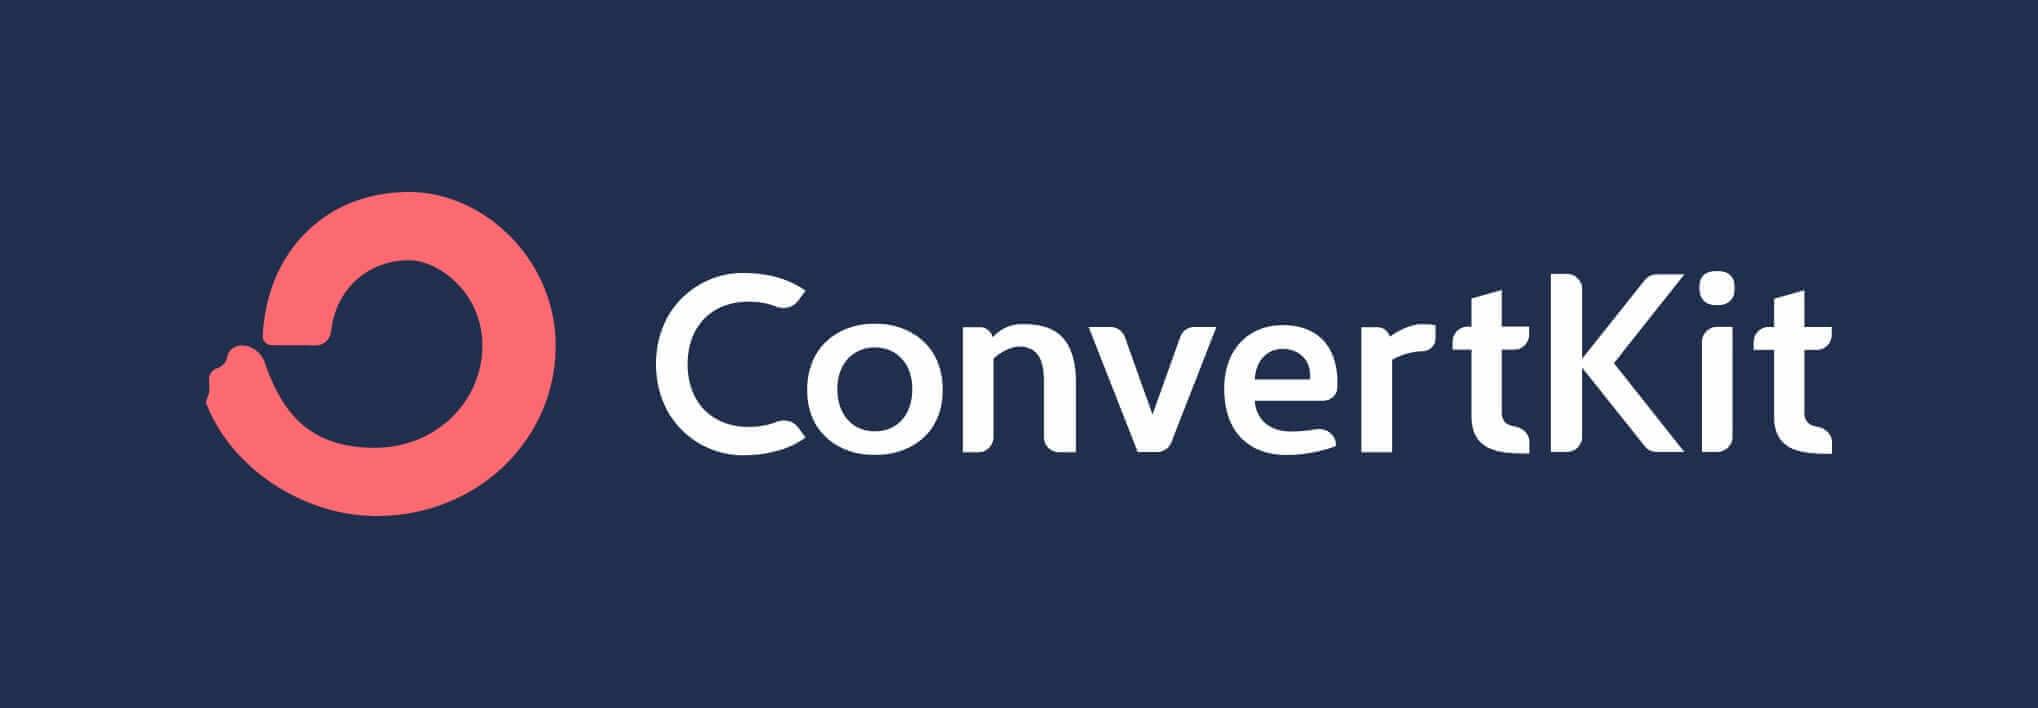 ConvertKit Brand Logo